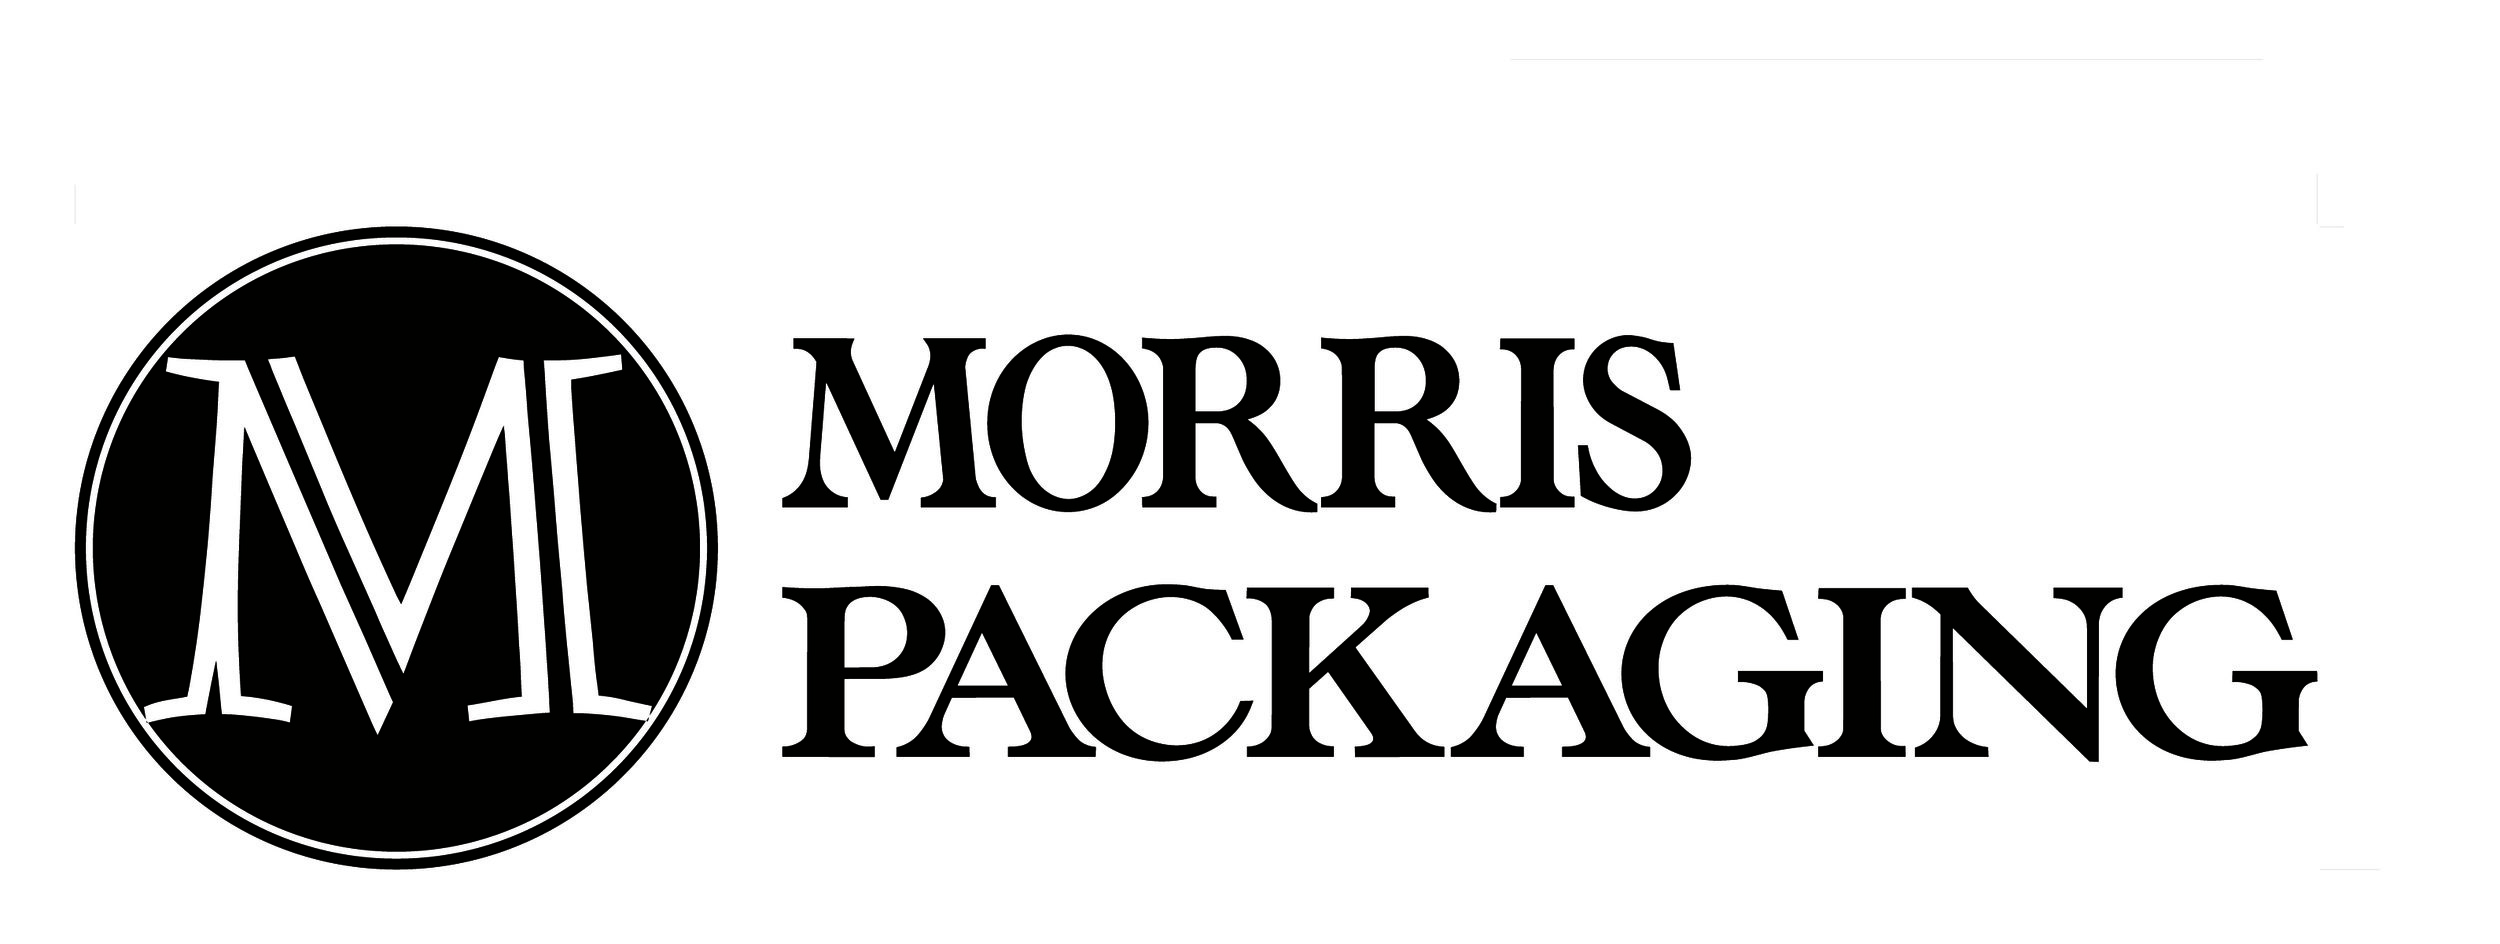 Reception Sponsor - Morris.jpg